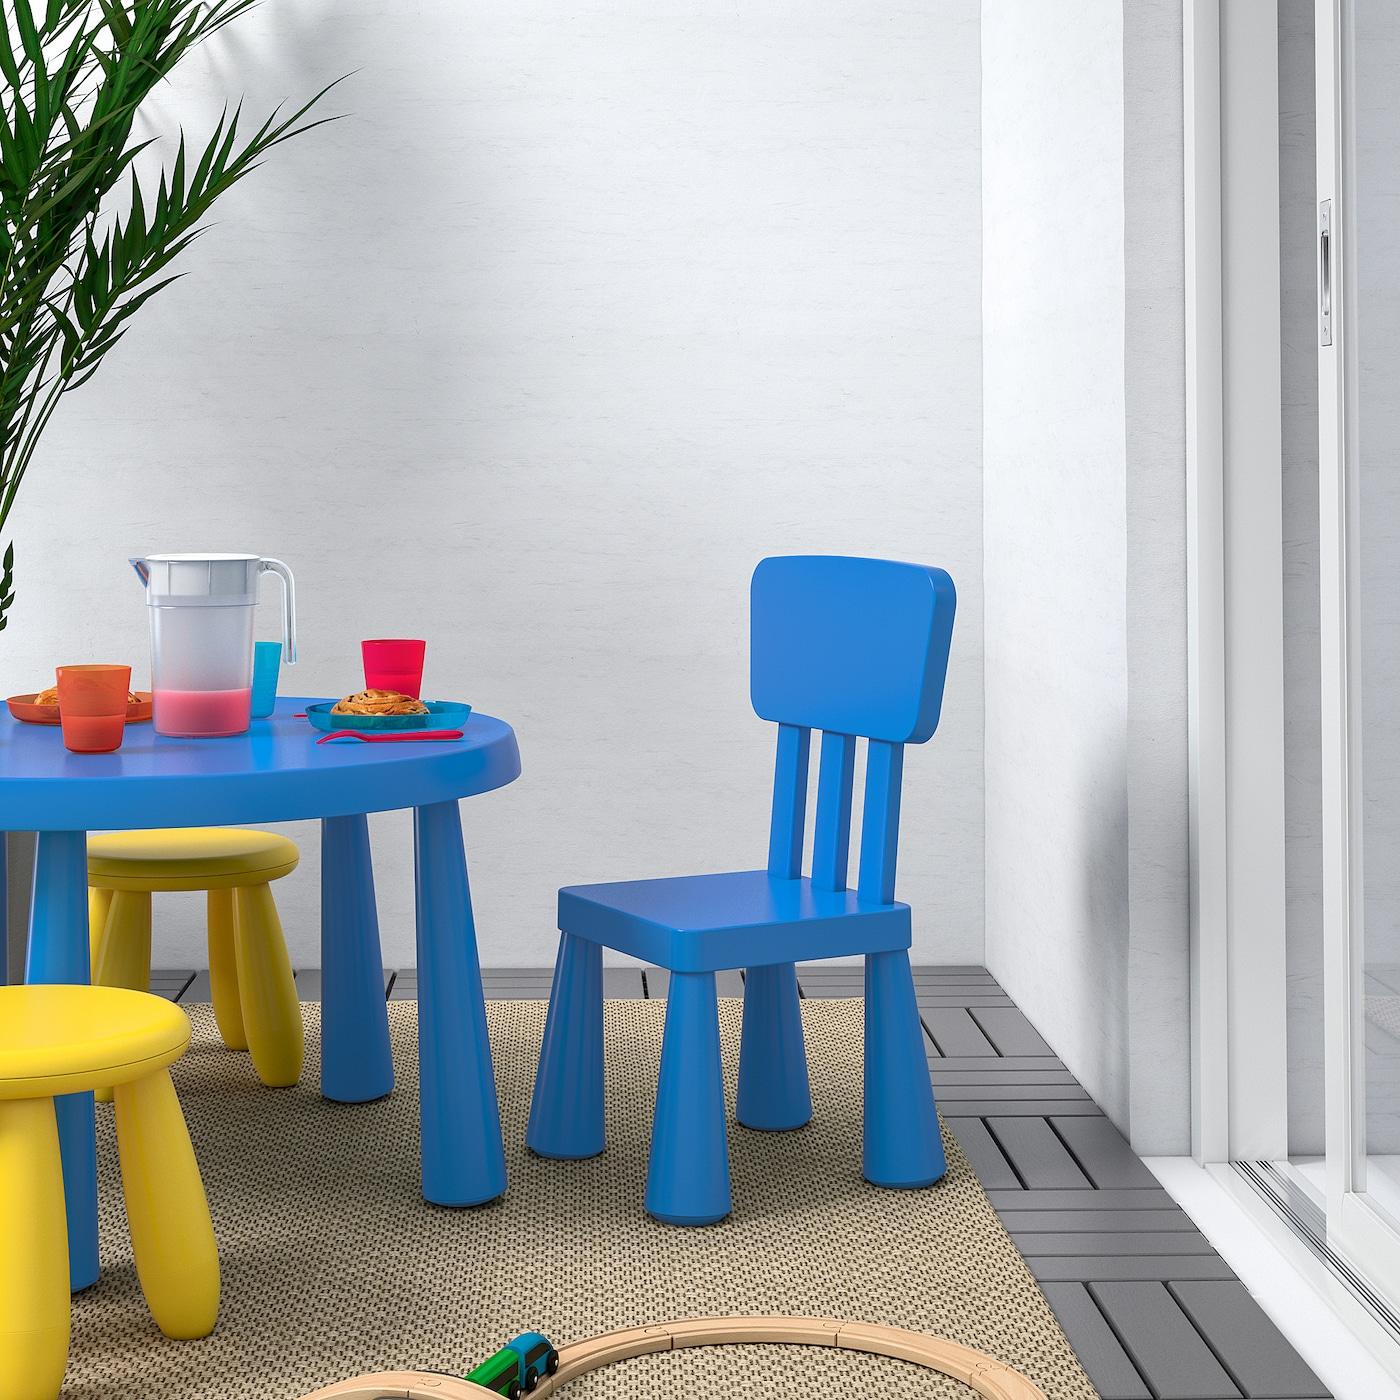 MAMMUT dečja stolica unutra/spolja/plava 39 cm 36 cm 67 cm 26 cm 30 cm